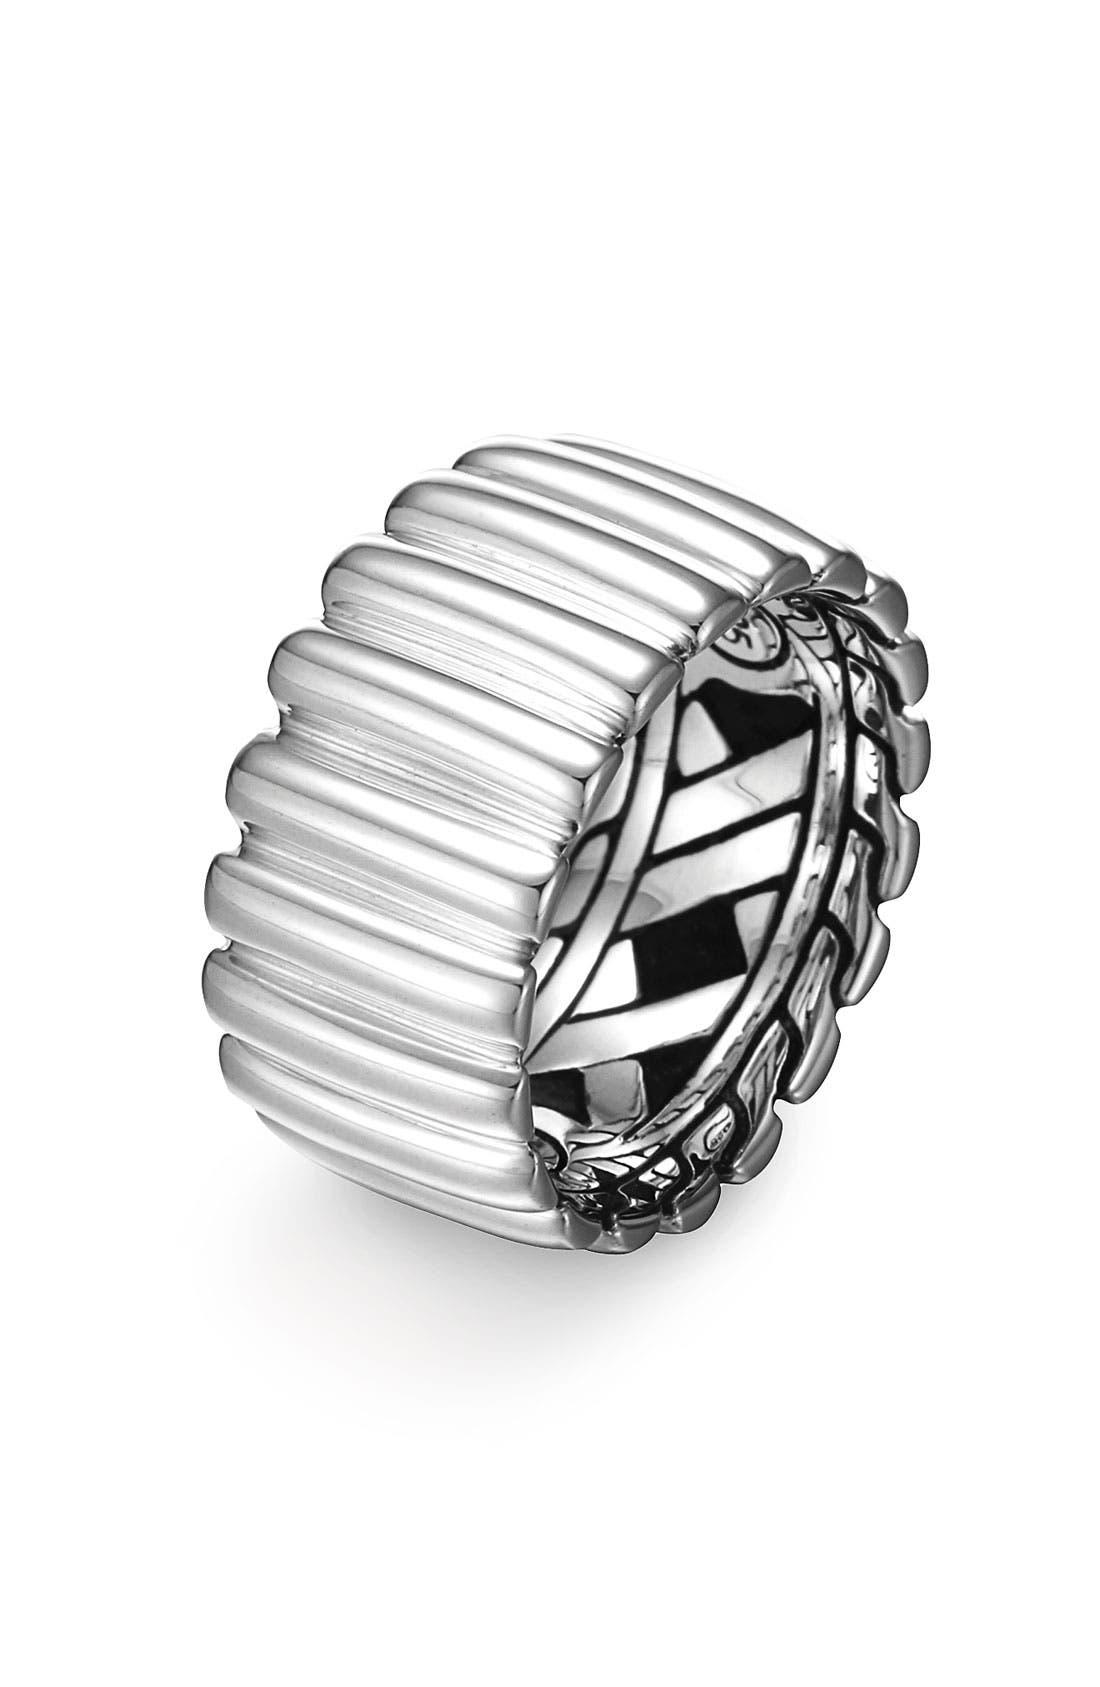 Alternate Image 1 Selected - John Hardy 'Bedeg' Wide Band Ring